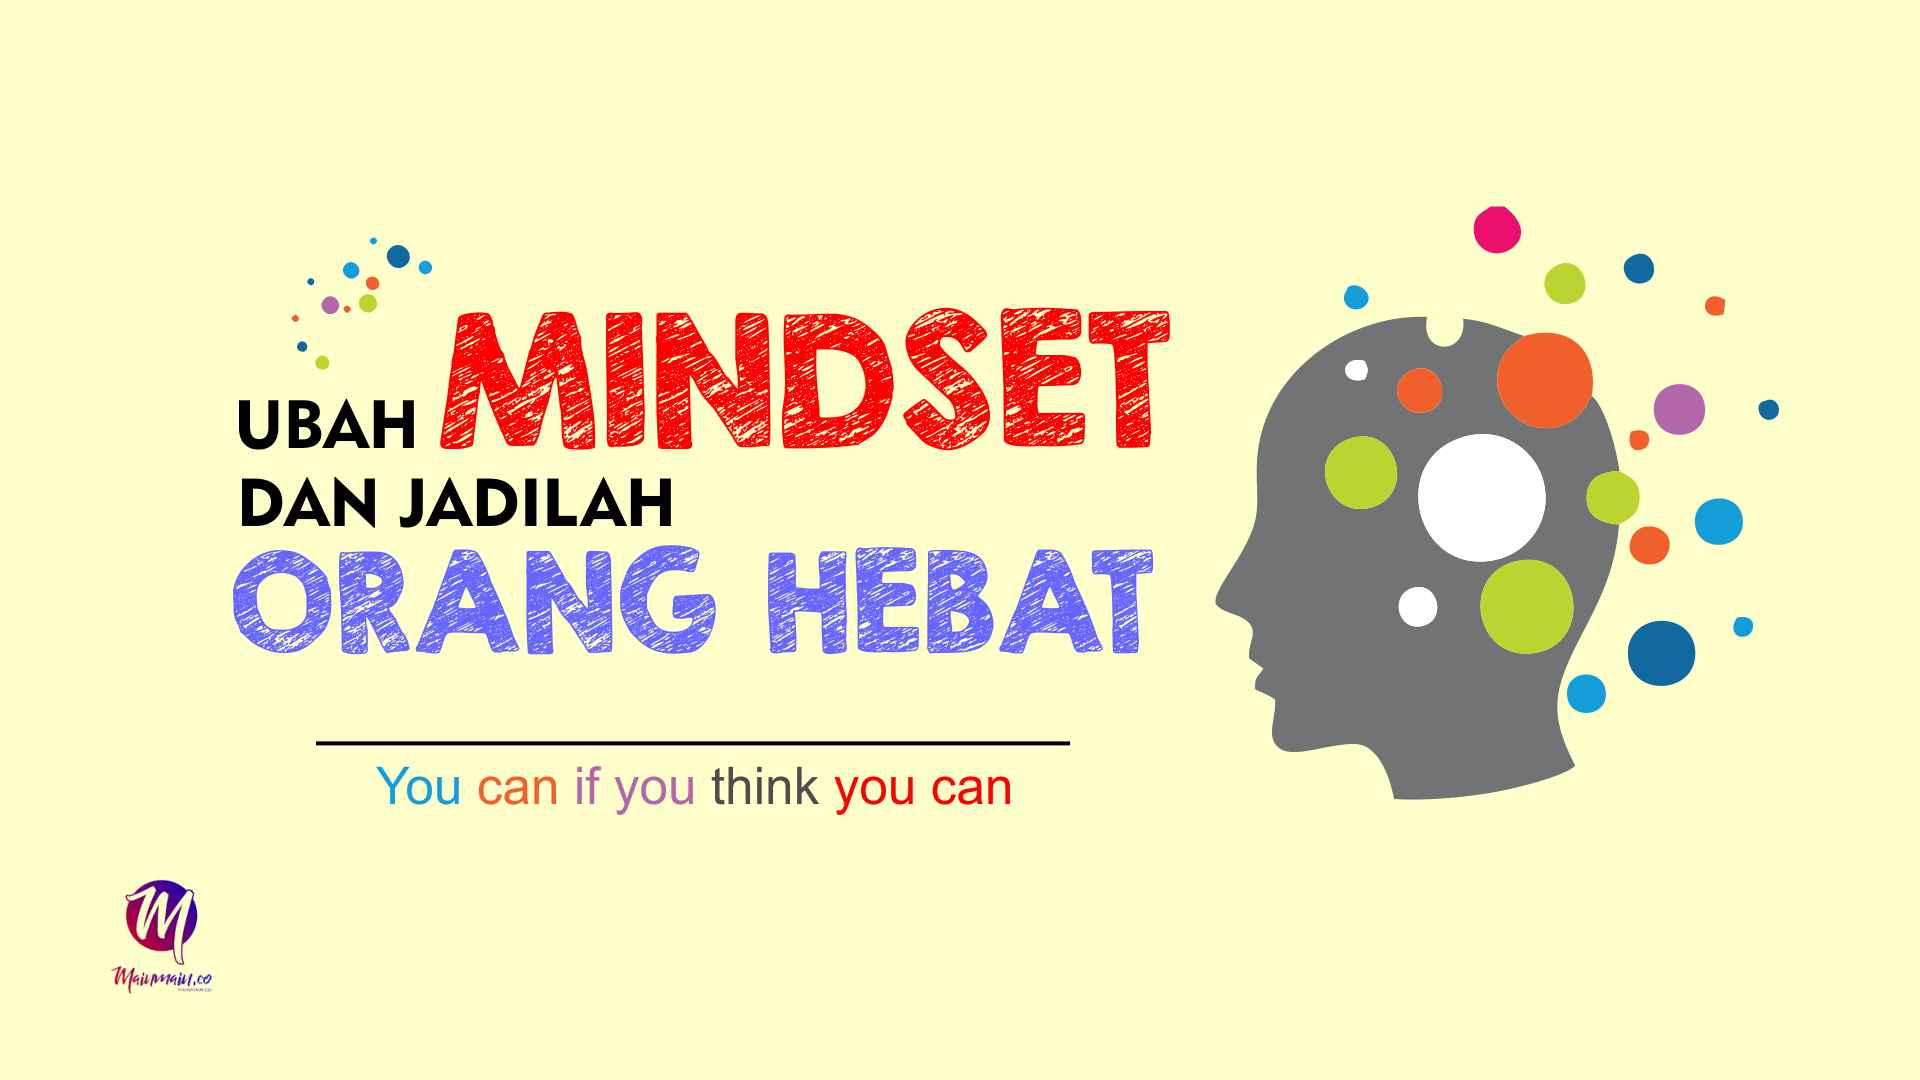 Ubah Mindset dan Jadilah Orang Hebat